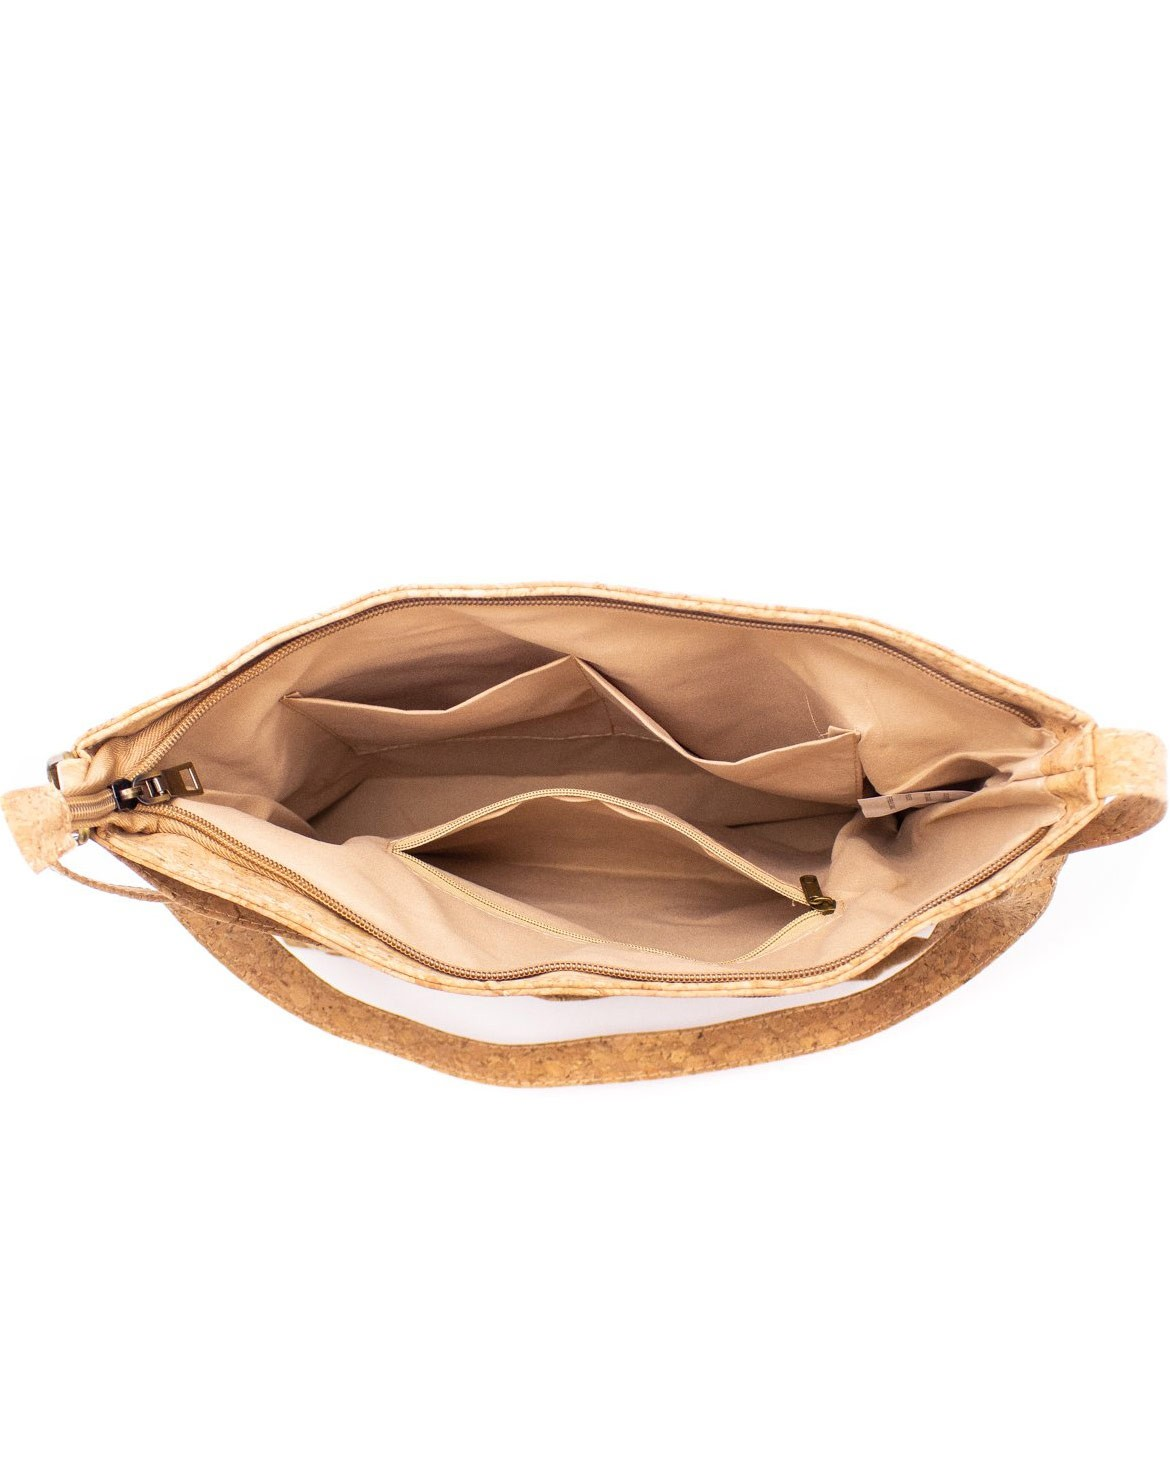 Mirabella Handtasche